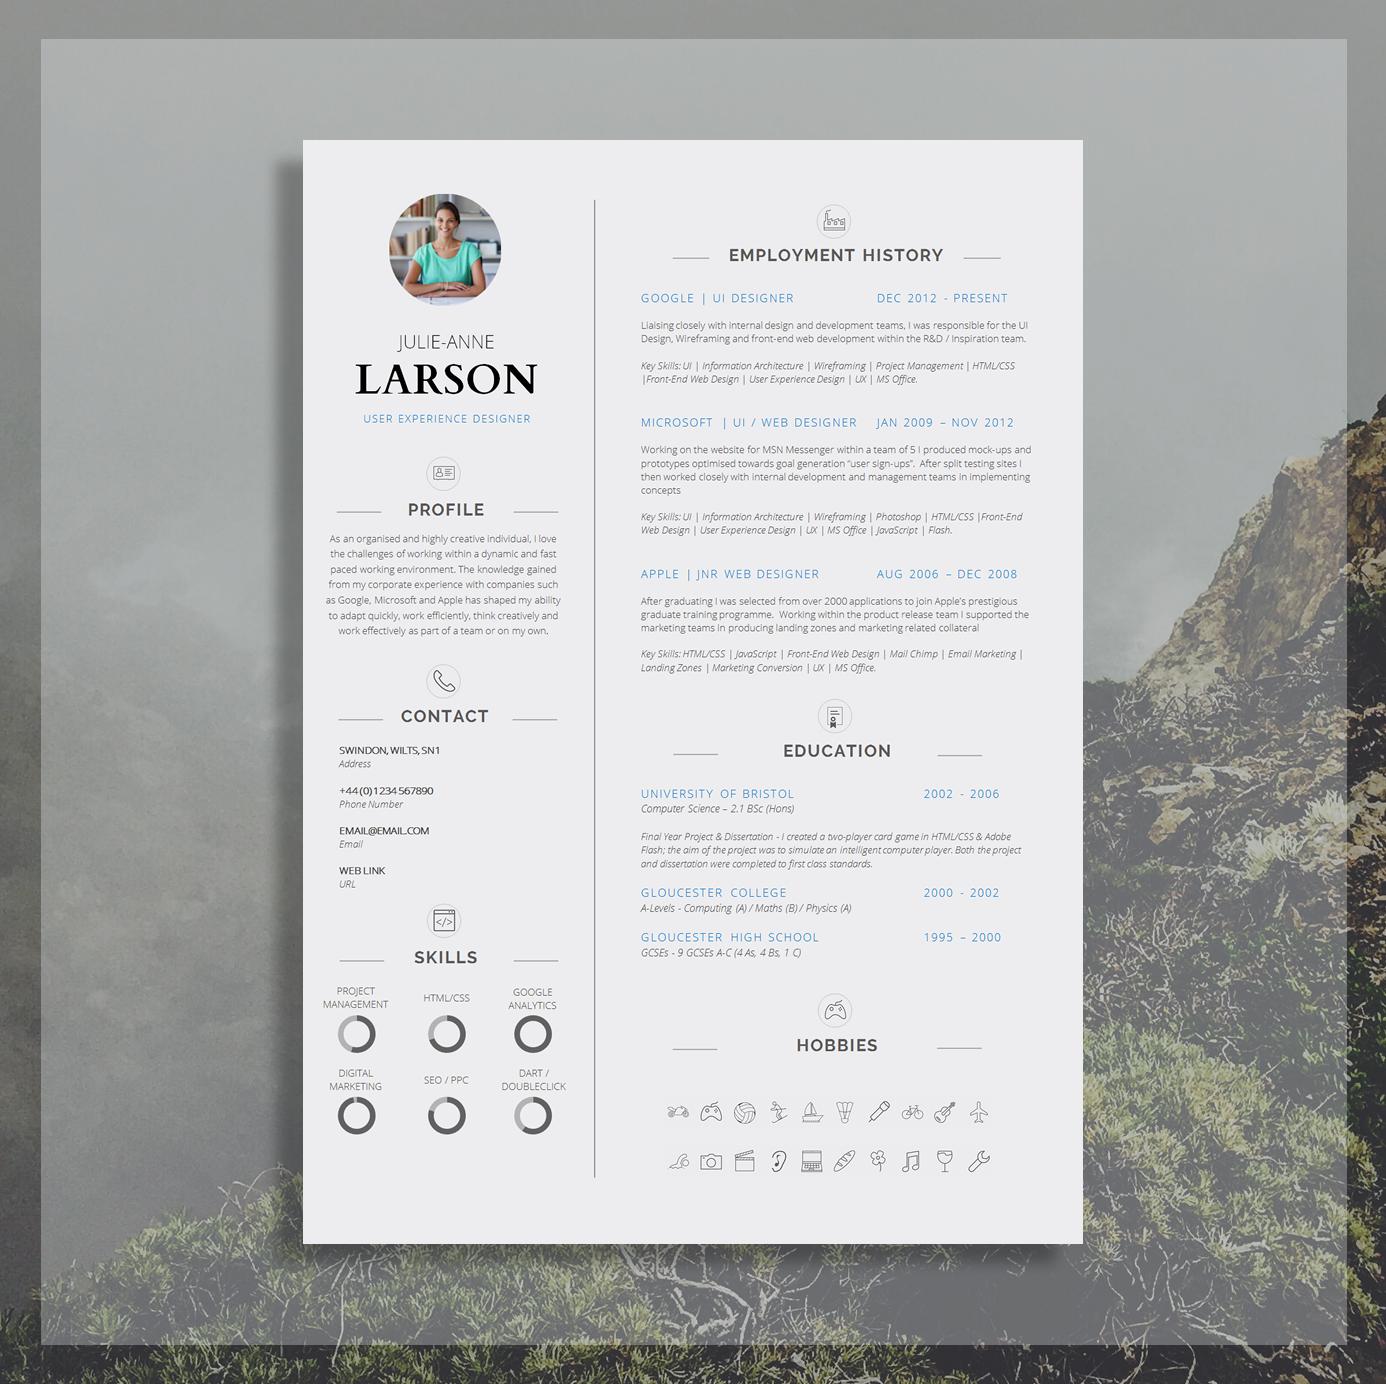 Resume Template Cv Template Cover Letter Application Advice Ms Word Resume Design Cv Design Instant Download Belgravia The Career